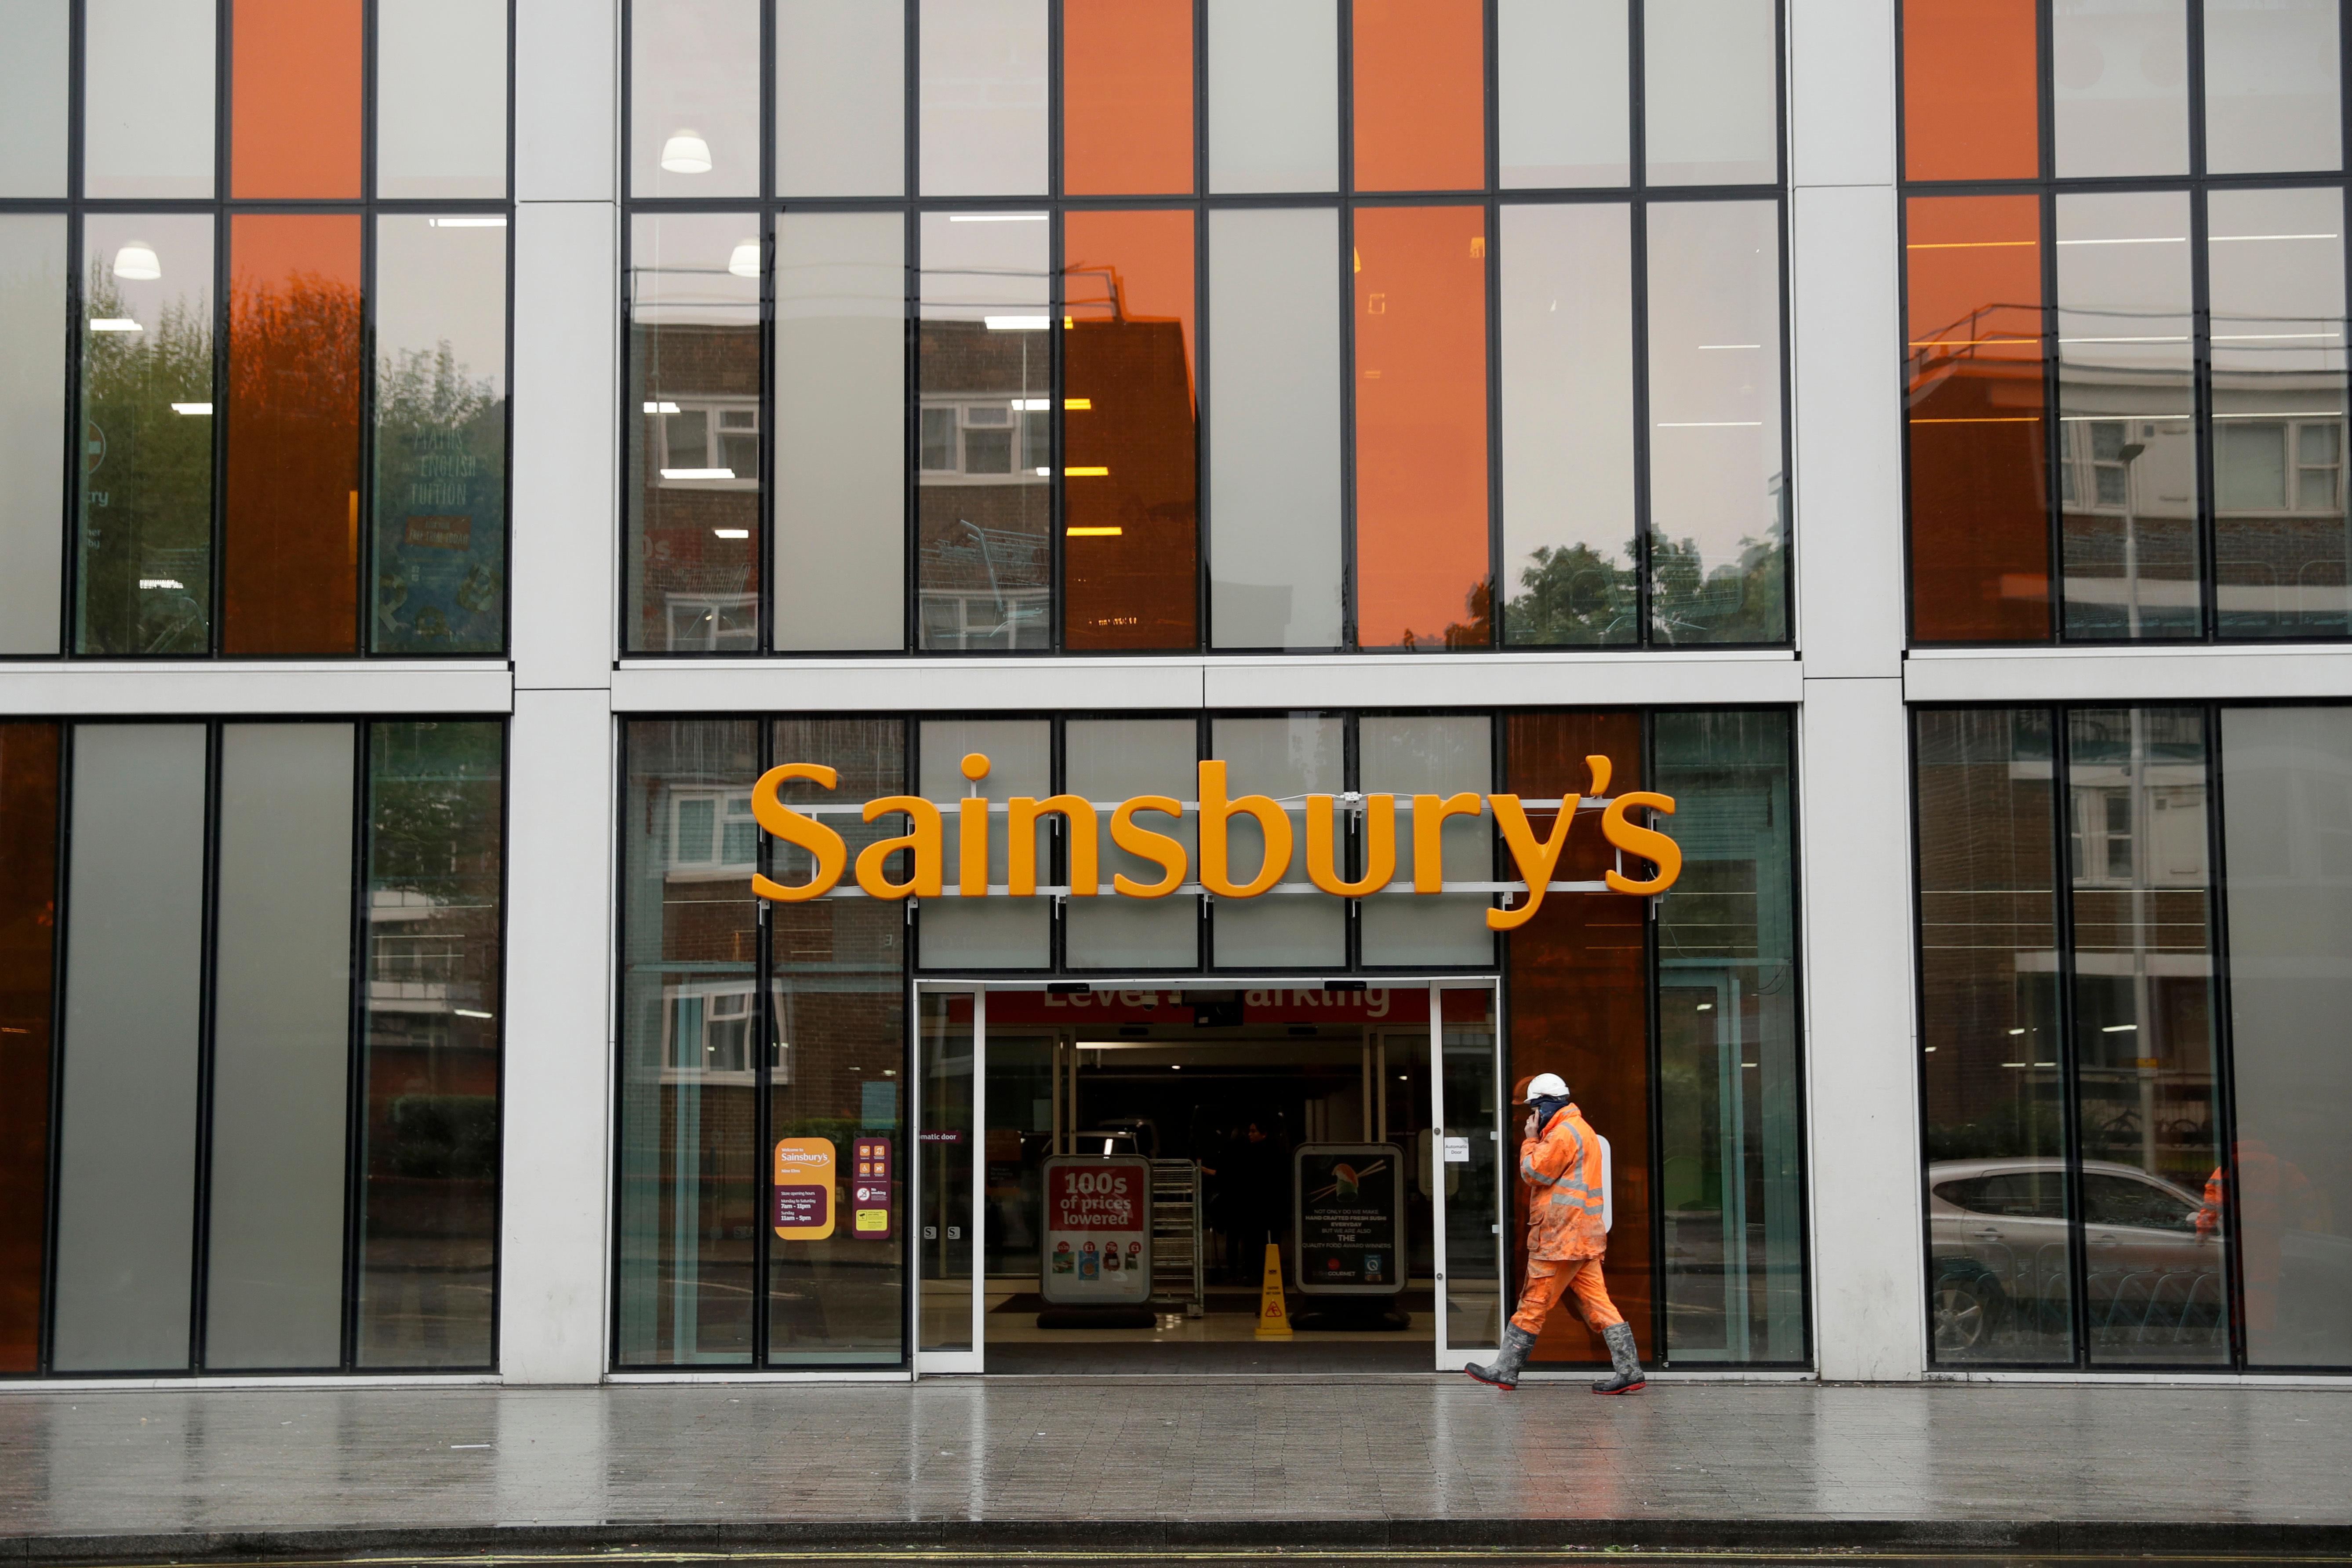 Sainsbury's flagship store